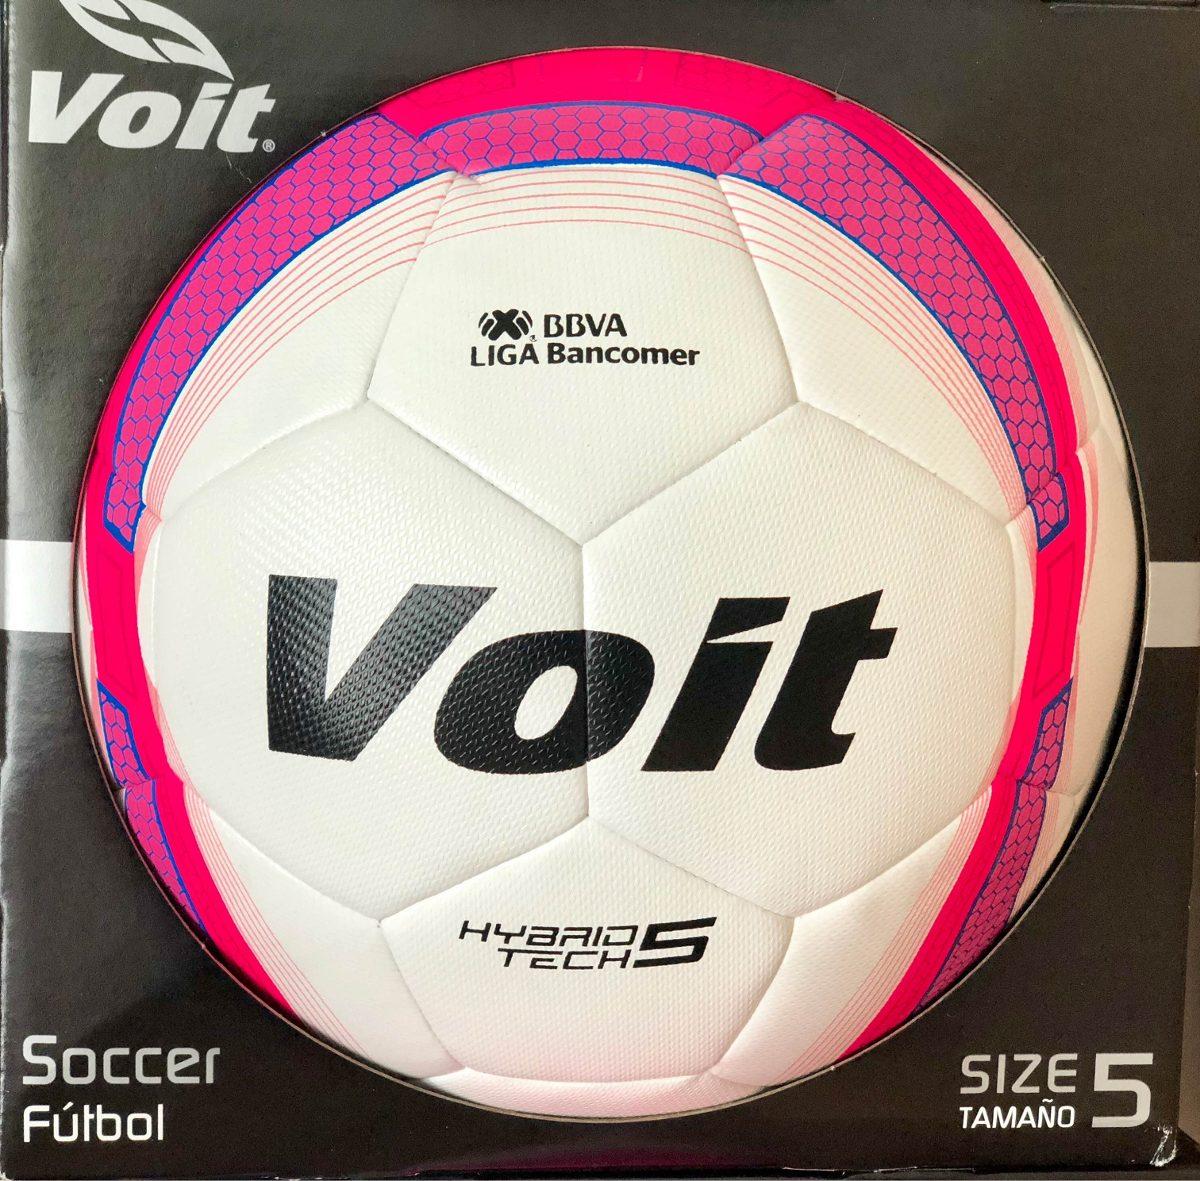 e10d2bafdb10b Voit Balon De Fútbol Lumo Hybrid Tech Réplica Liga Mx -   175.00 en ...